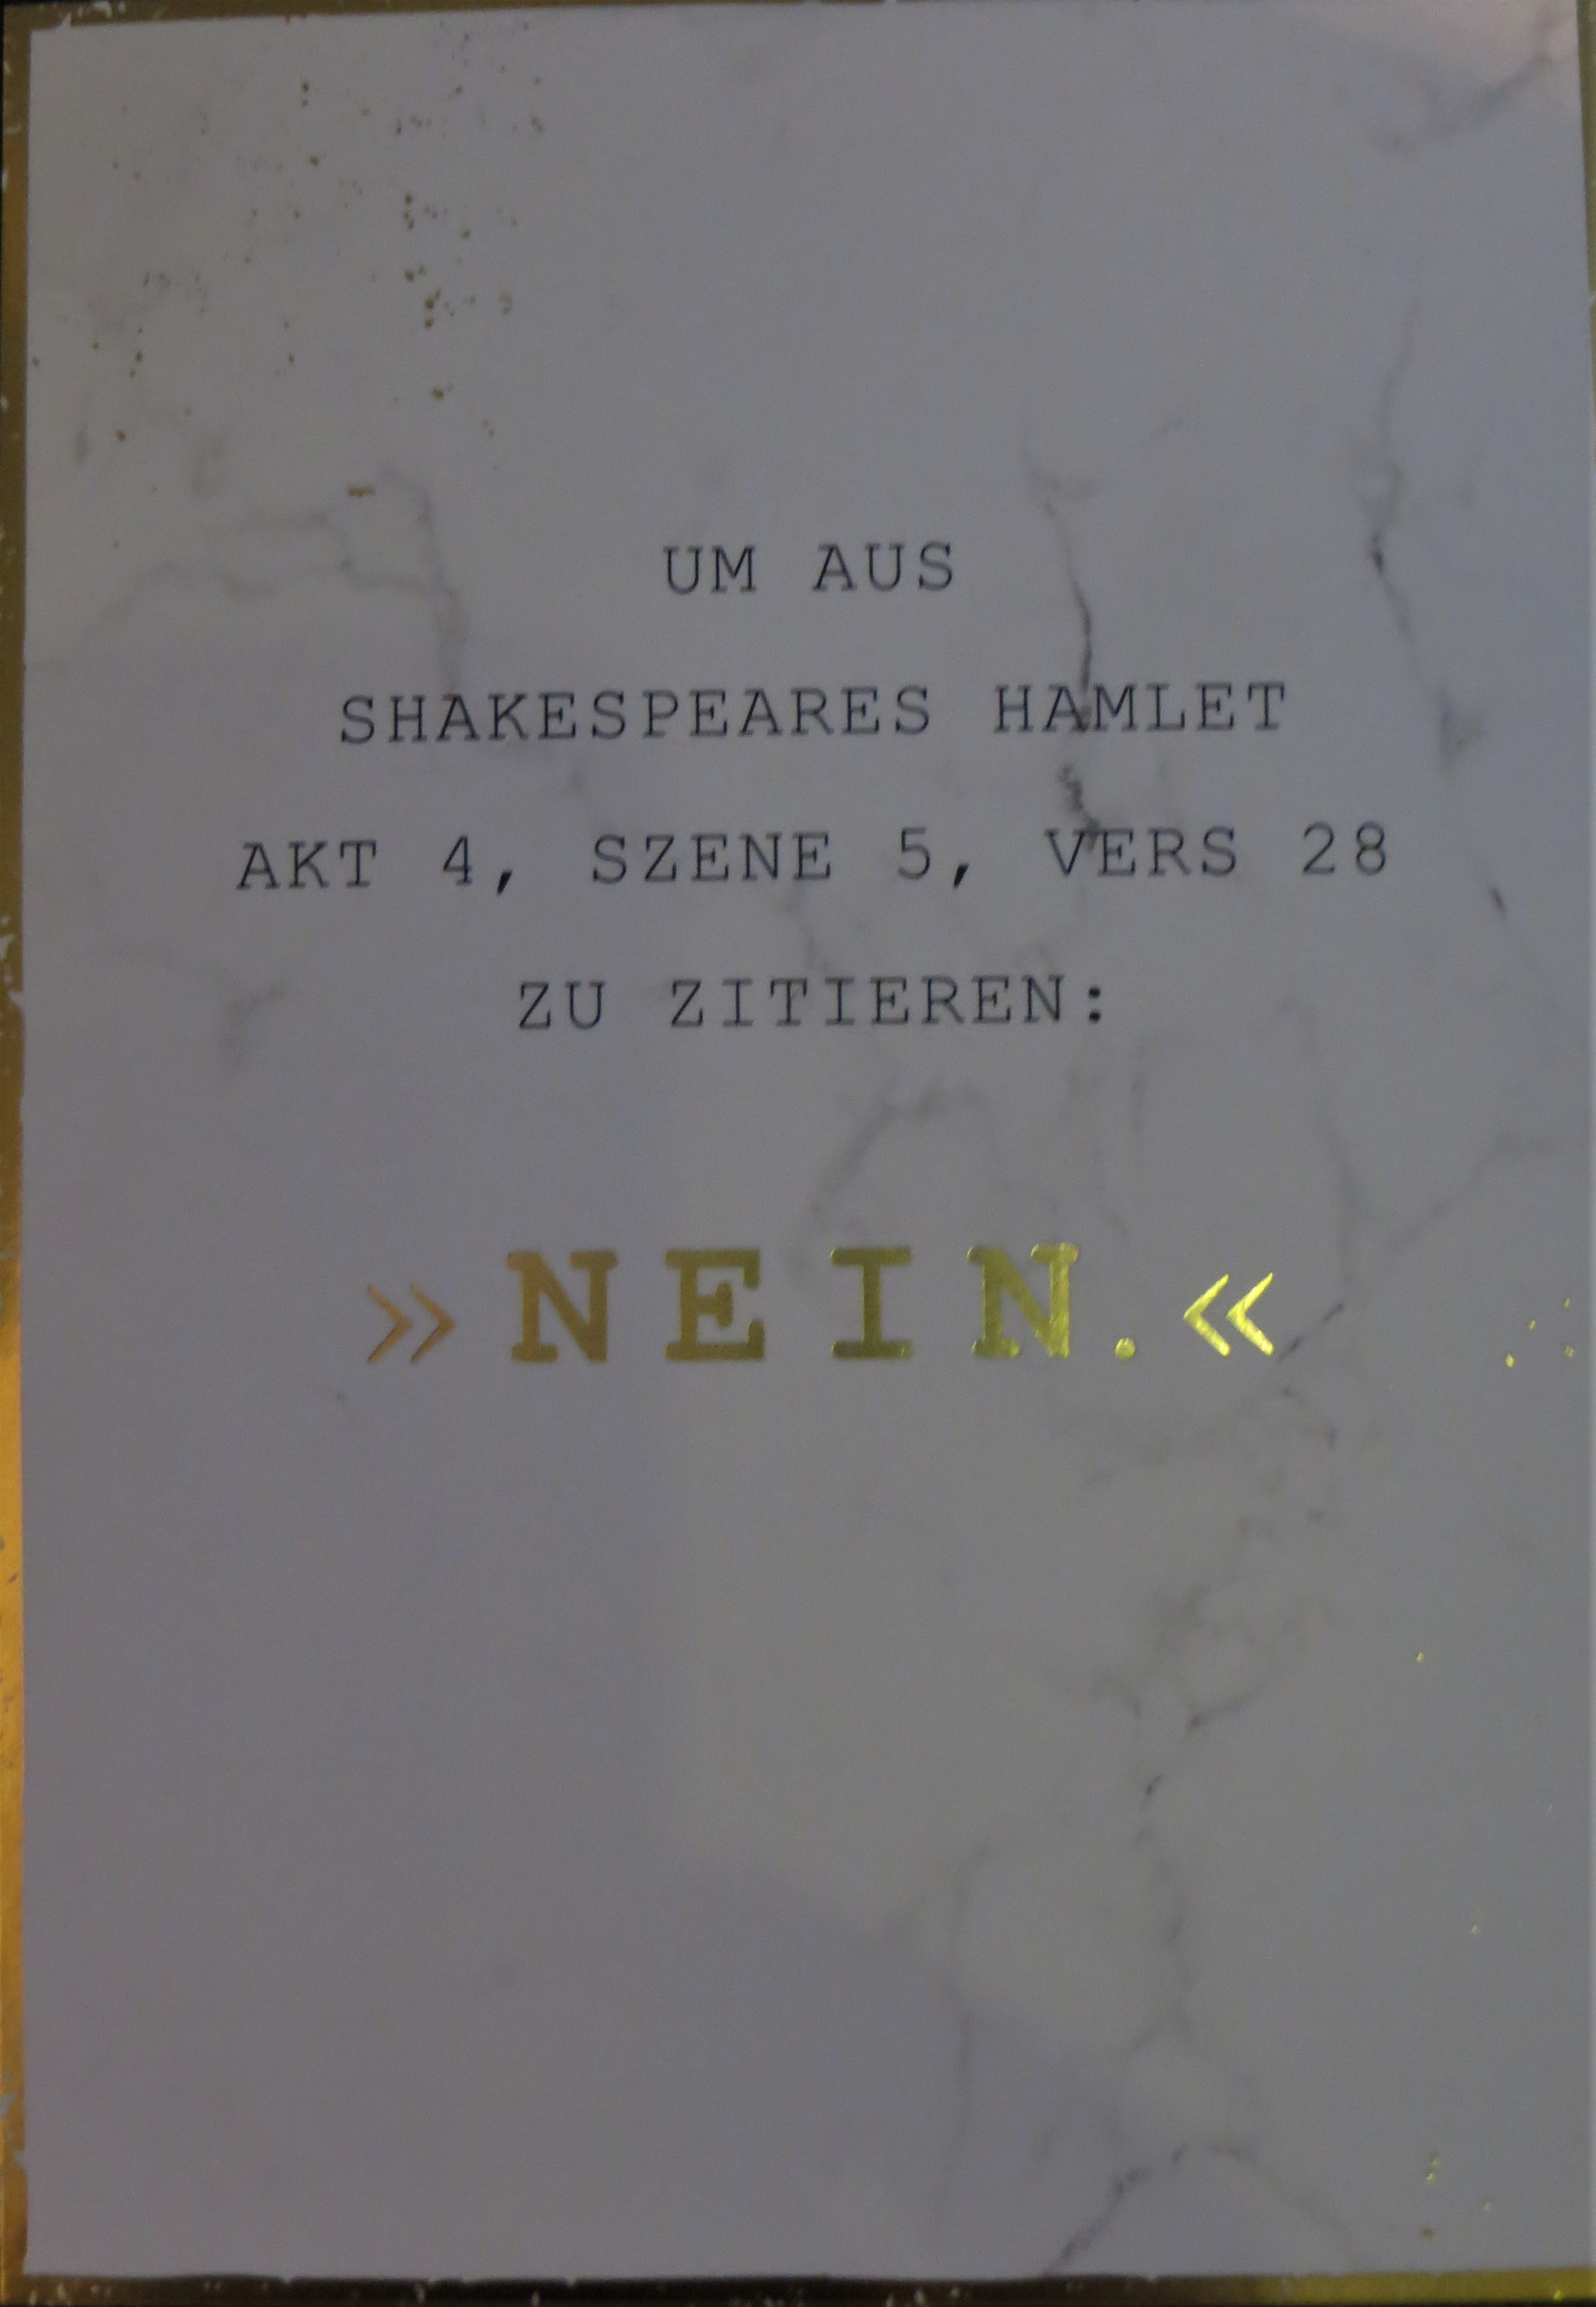 Postkarte Um das Shakespeares Hamlet Akt 4 Szene 5 Vers 28 zu zitieren NEIN. VintageArt